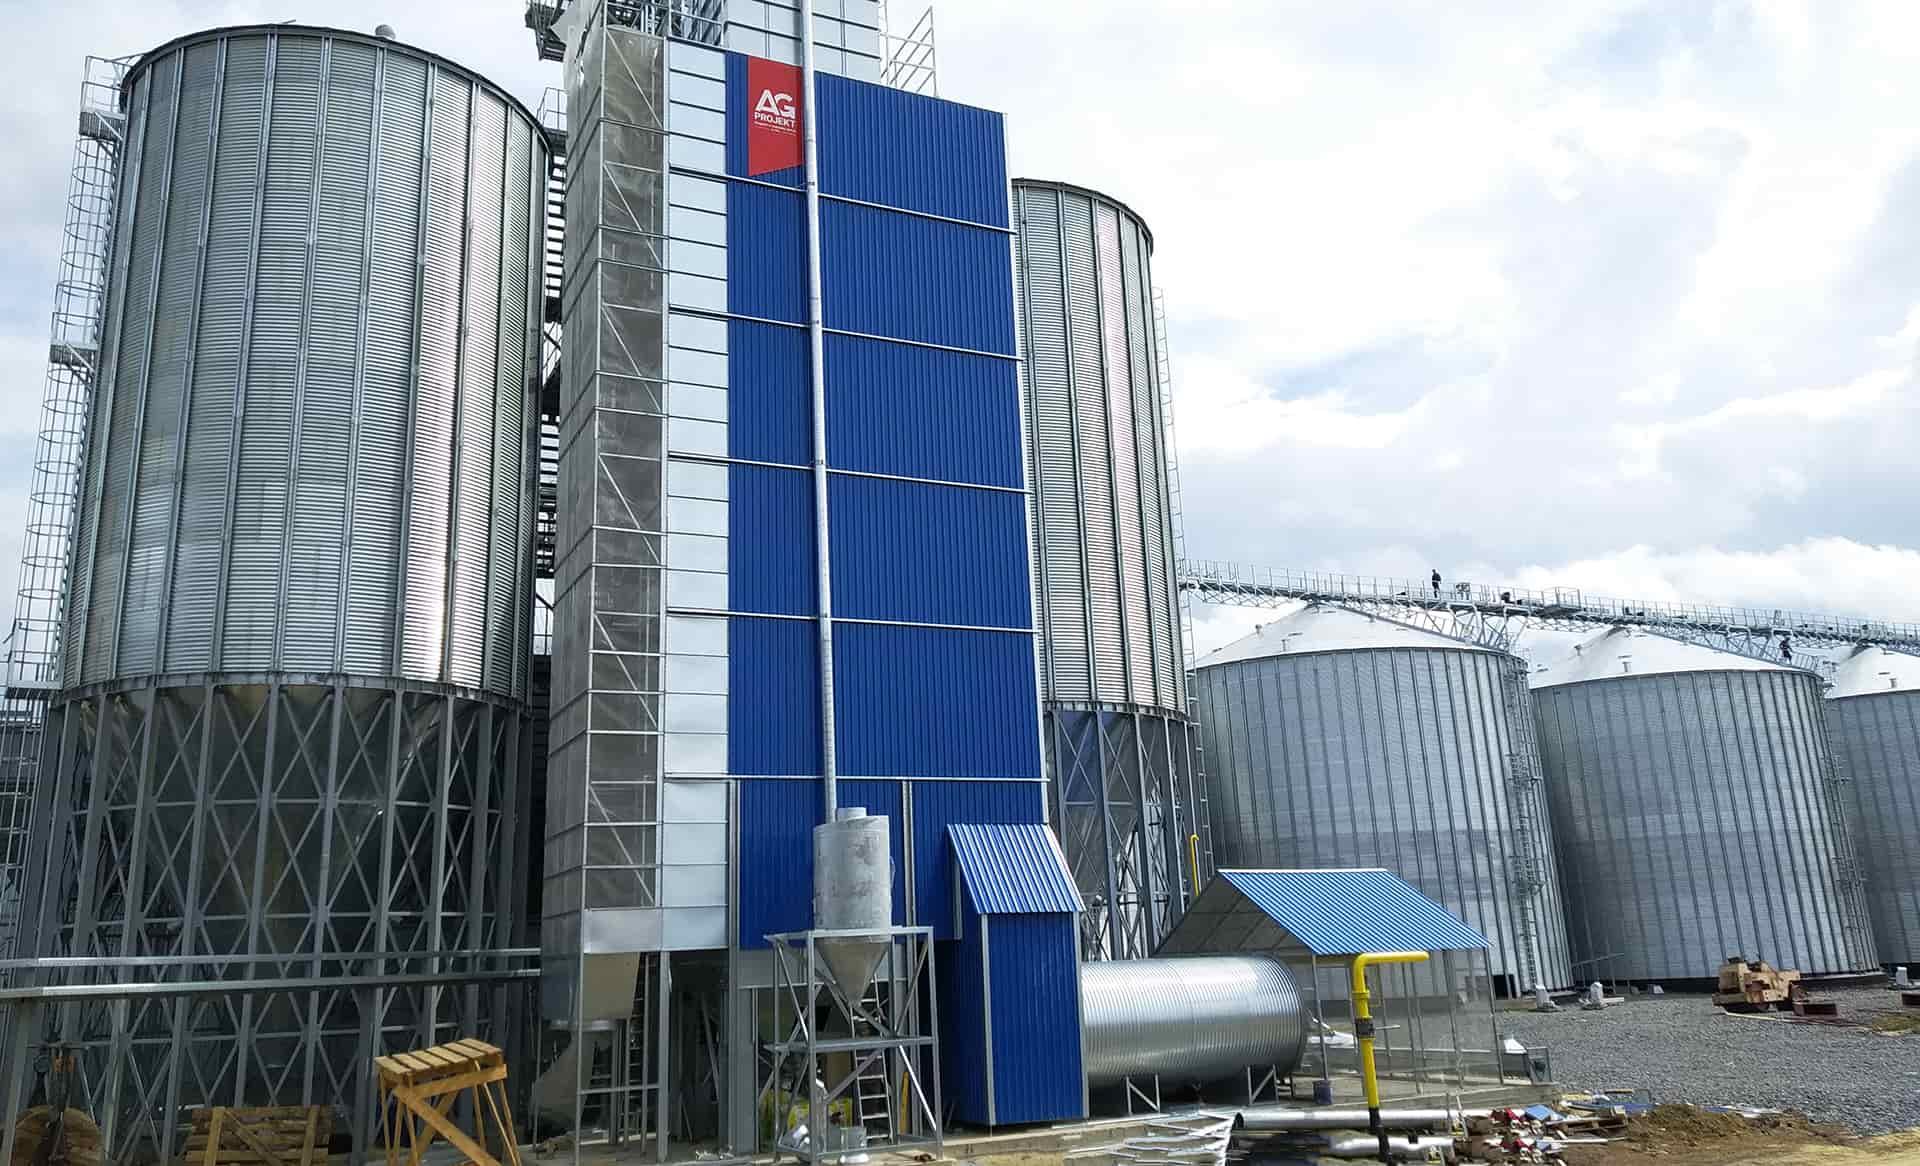 оборудование для сушки зерна на элеваторах